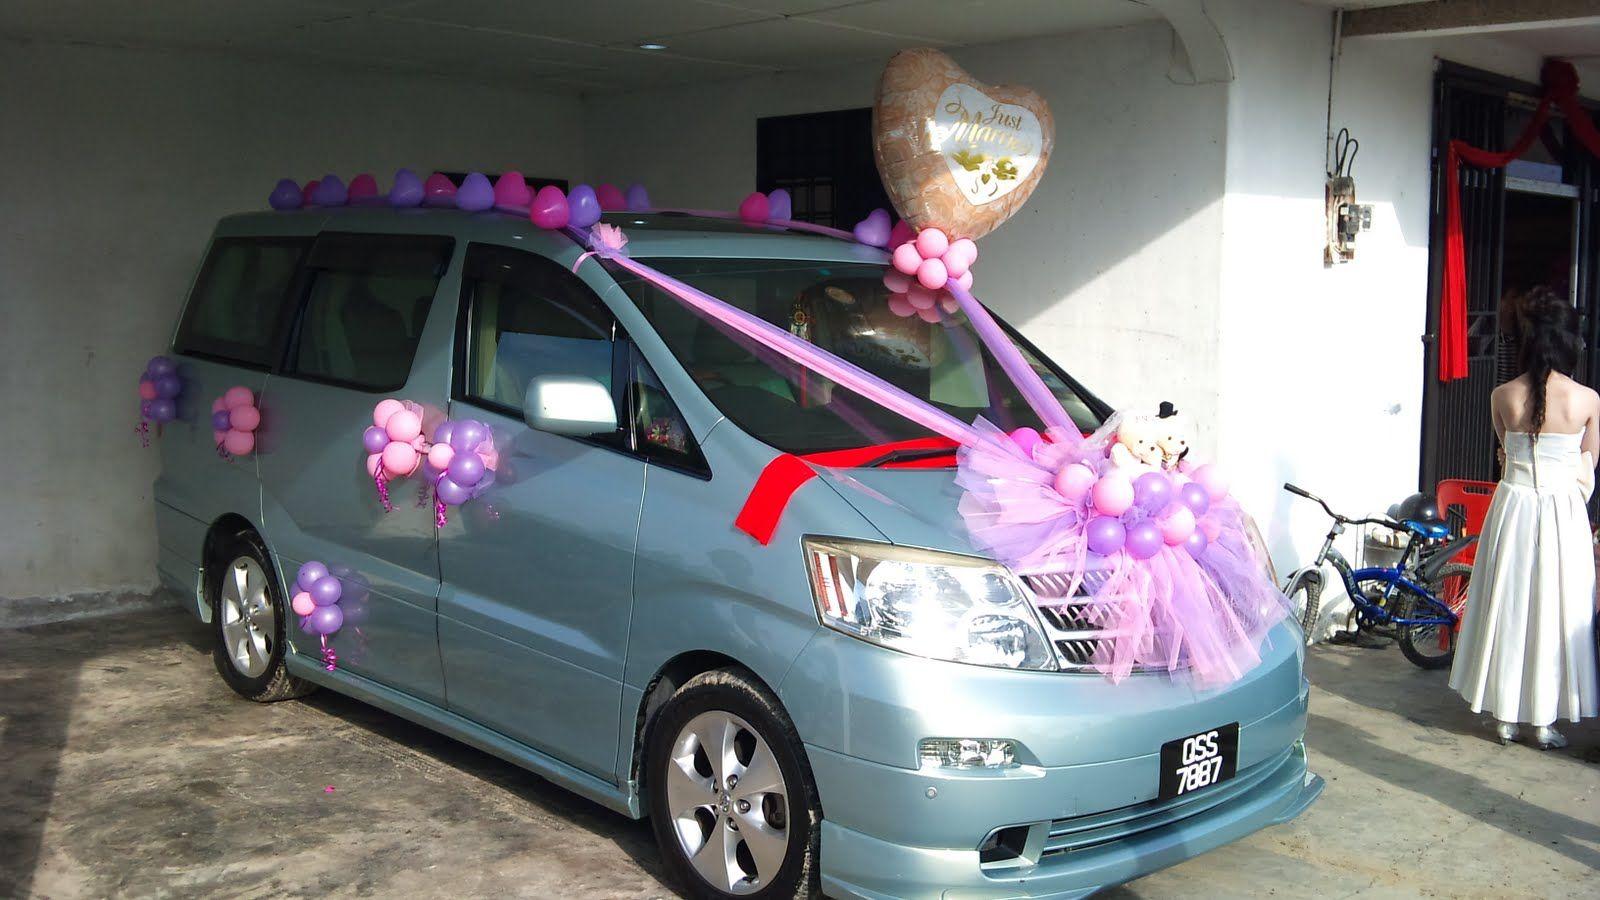 Wedding Car Decorate Wedding Car Decorated With New Ideas Wedding Cars Decorted